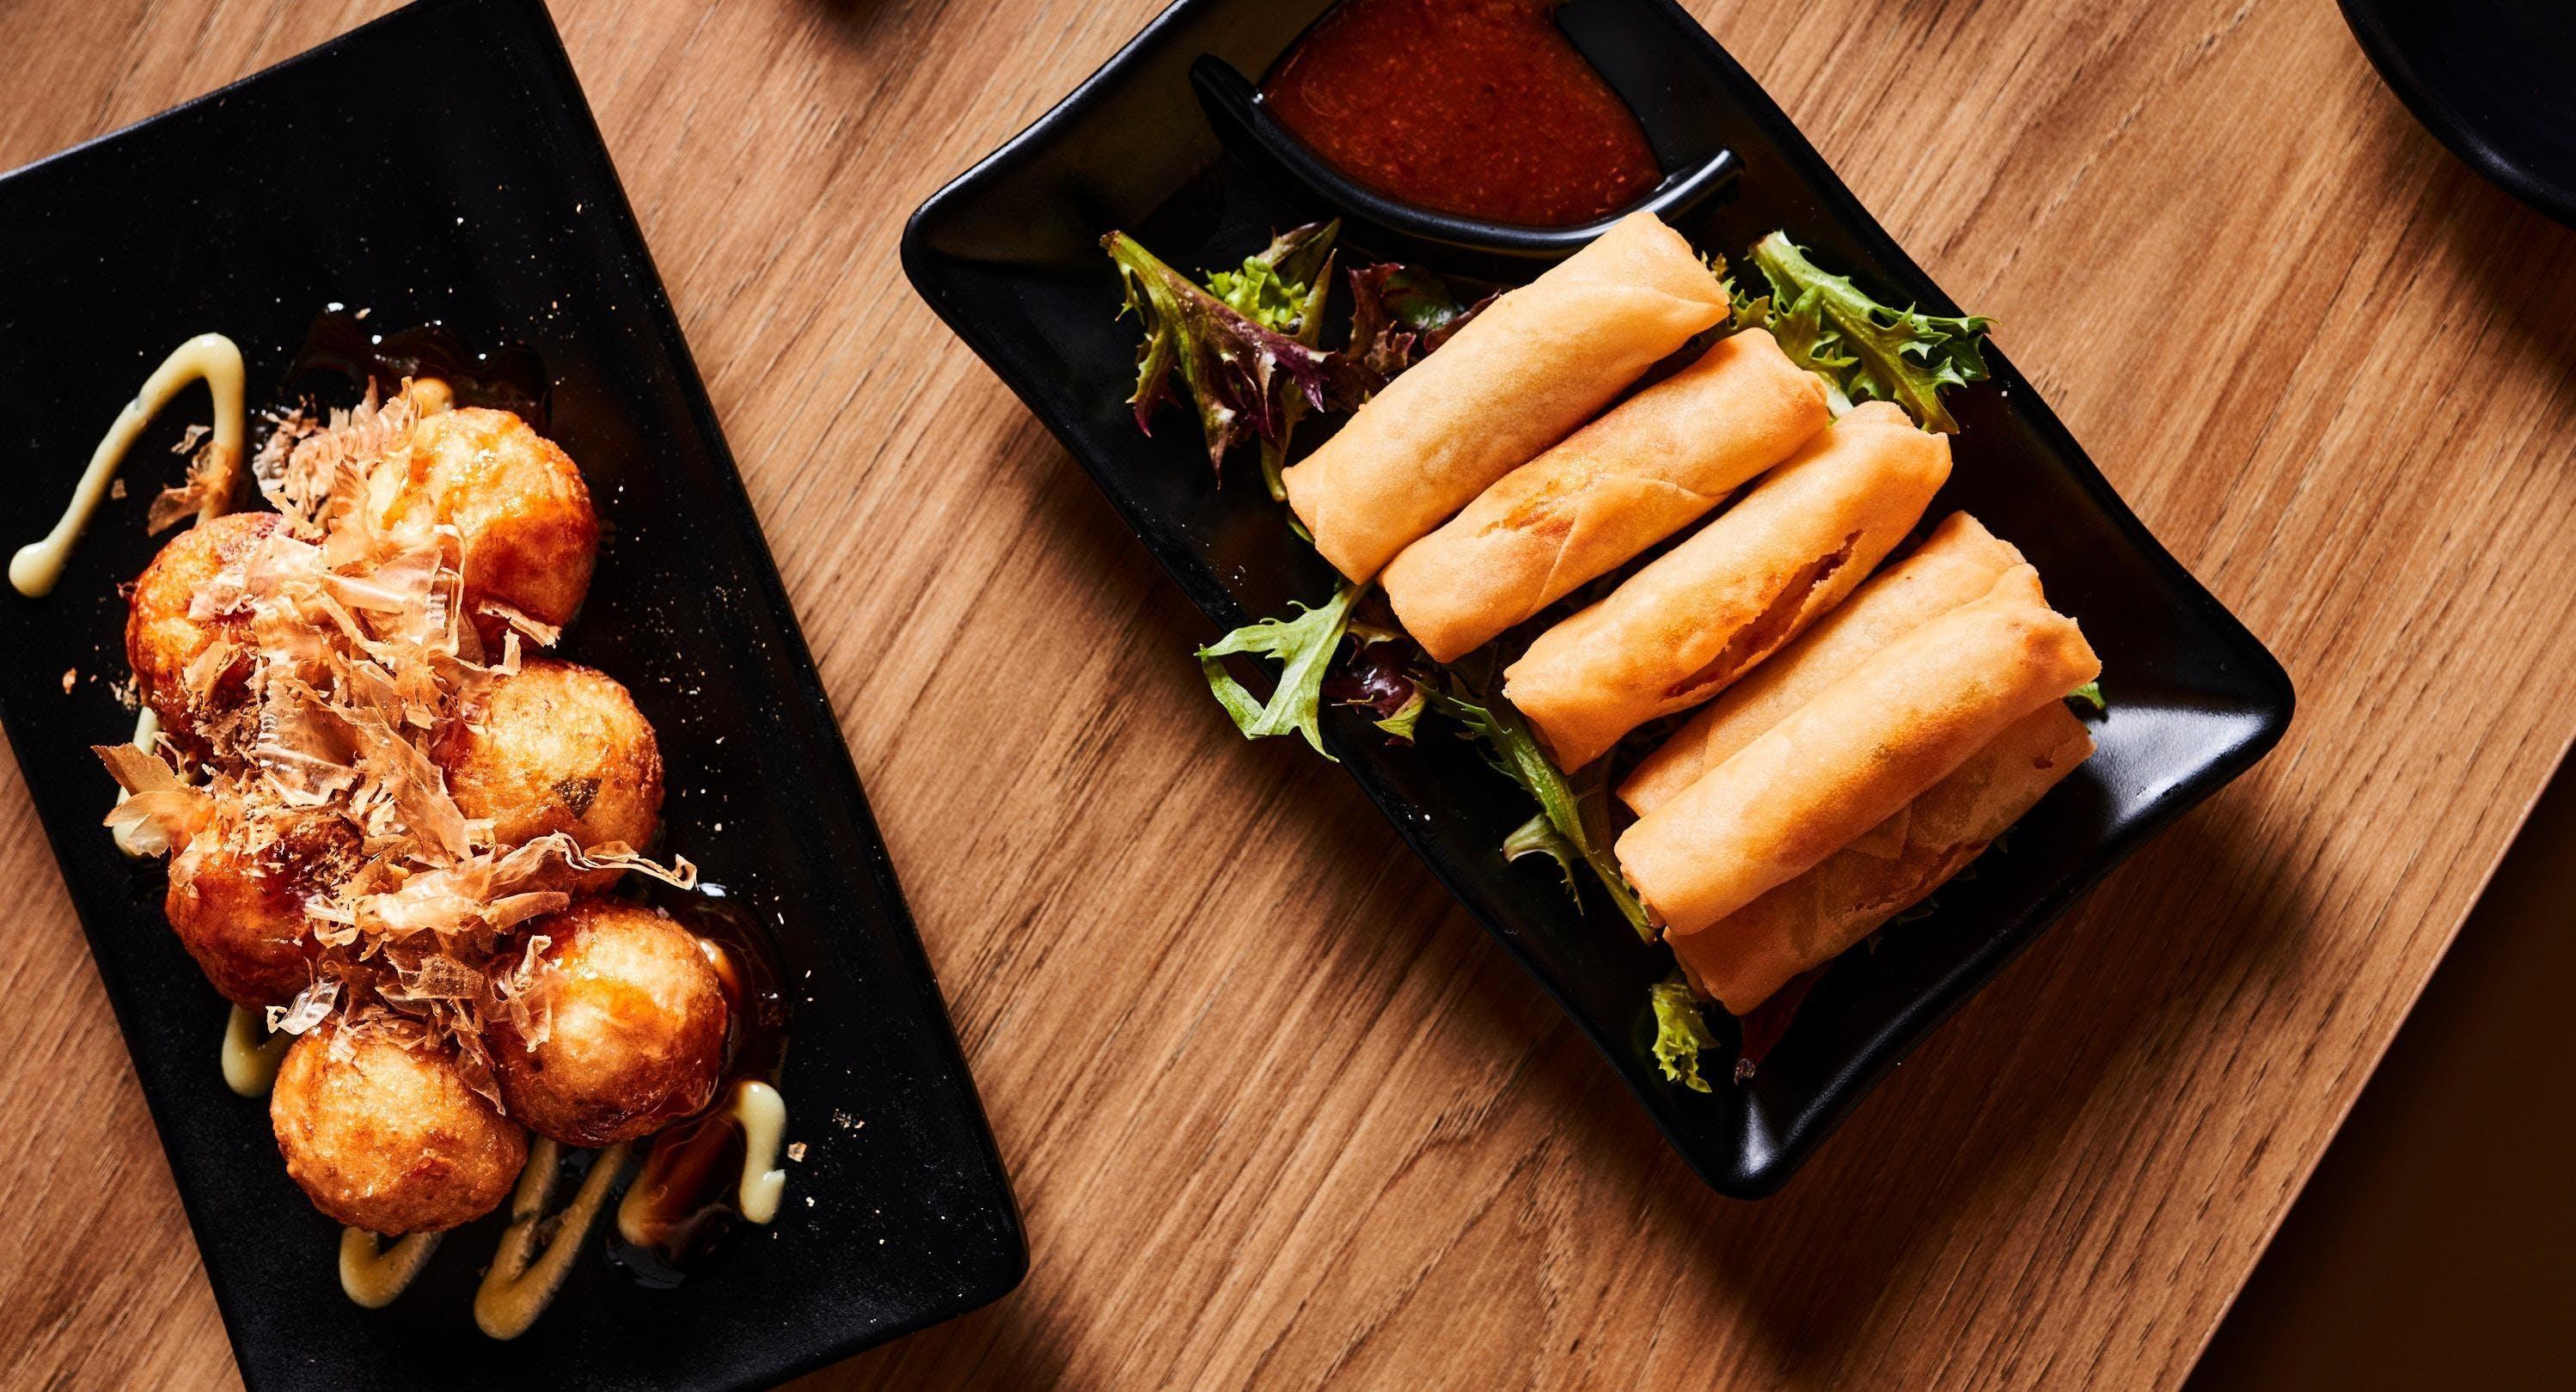 Photo of restaurant Okami - Pennant Hills in Pennant Hills, Sydney